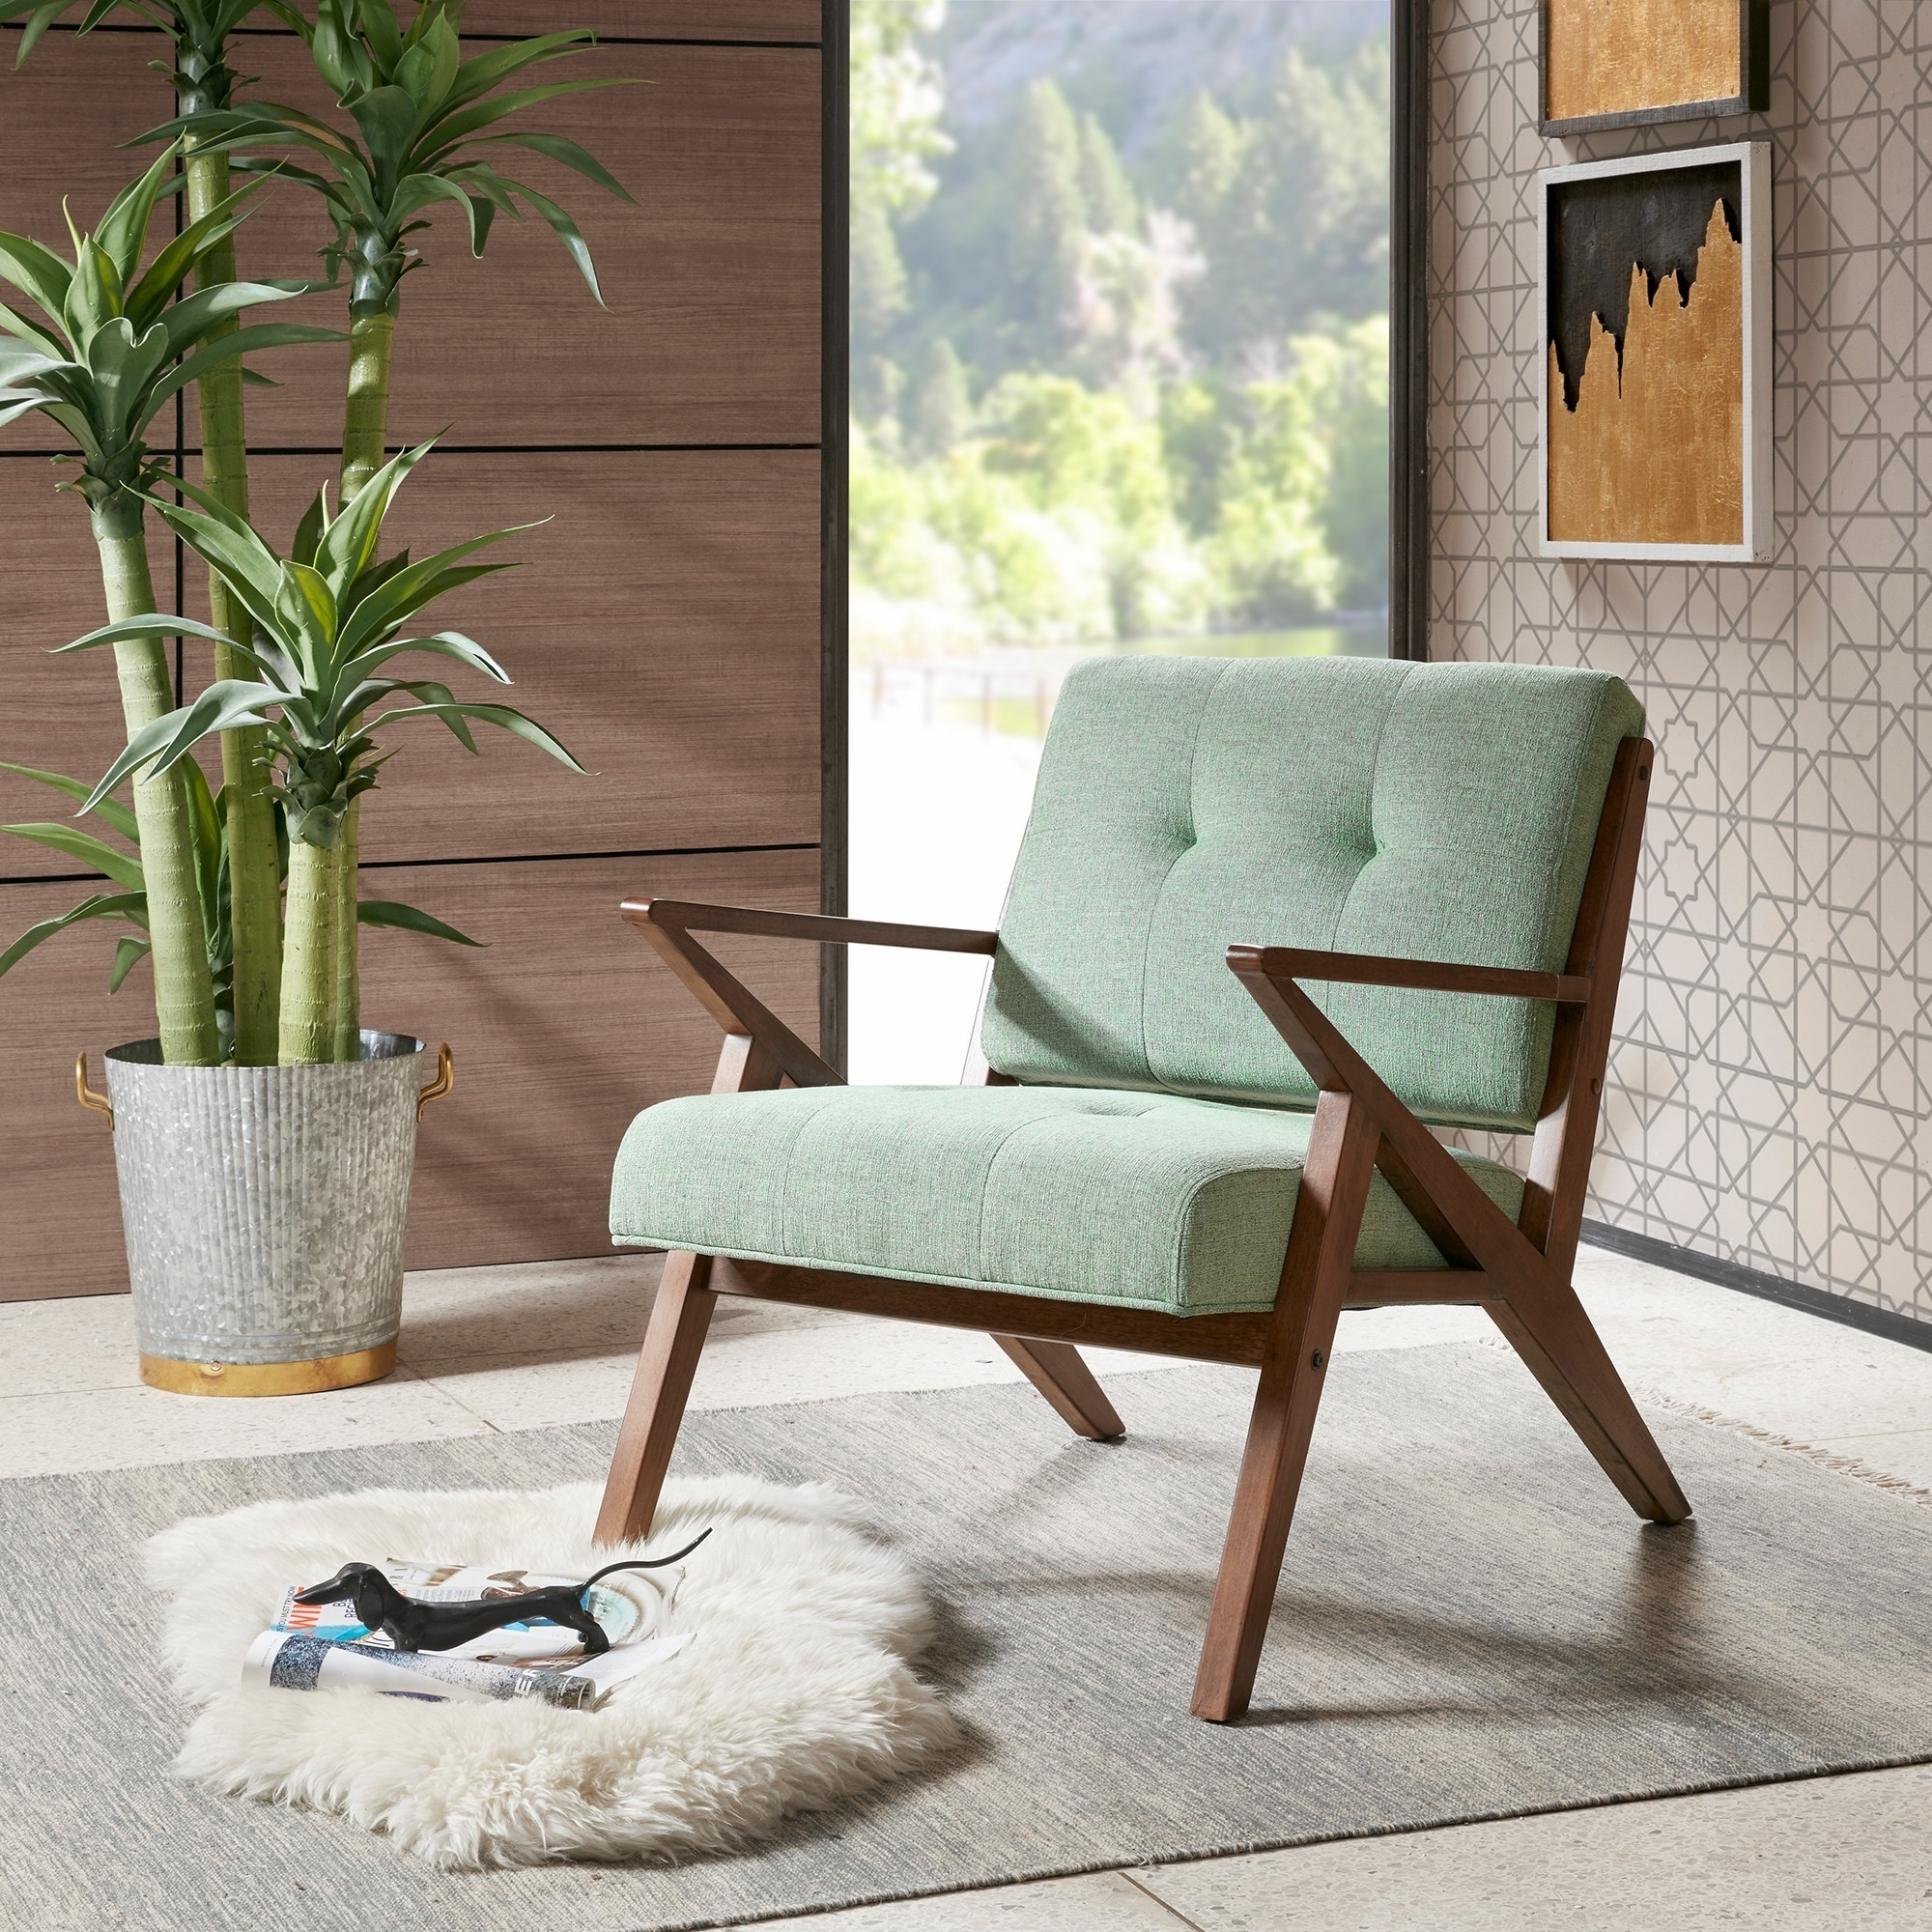 Carson Carrington Mustvee Seafoam/ Pecan Lounger Arm Chair (33.5Wx30Dx32.5H-Light Blue)